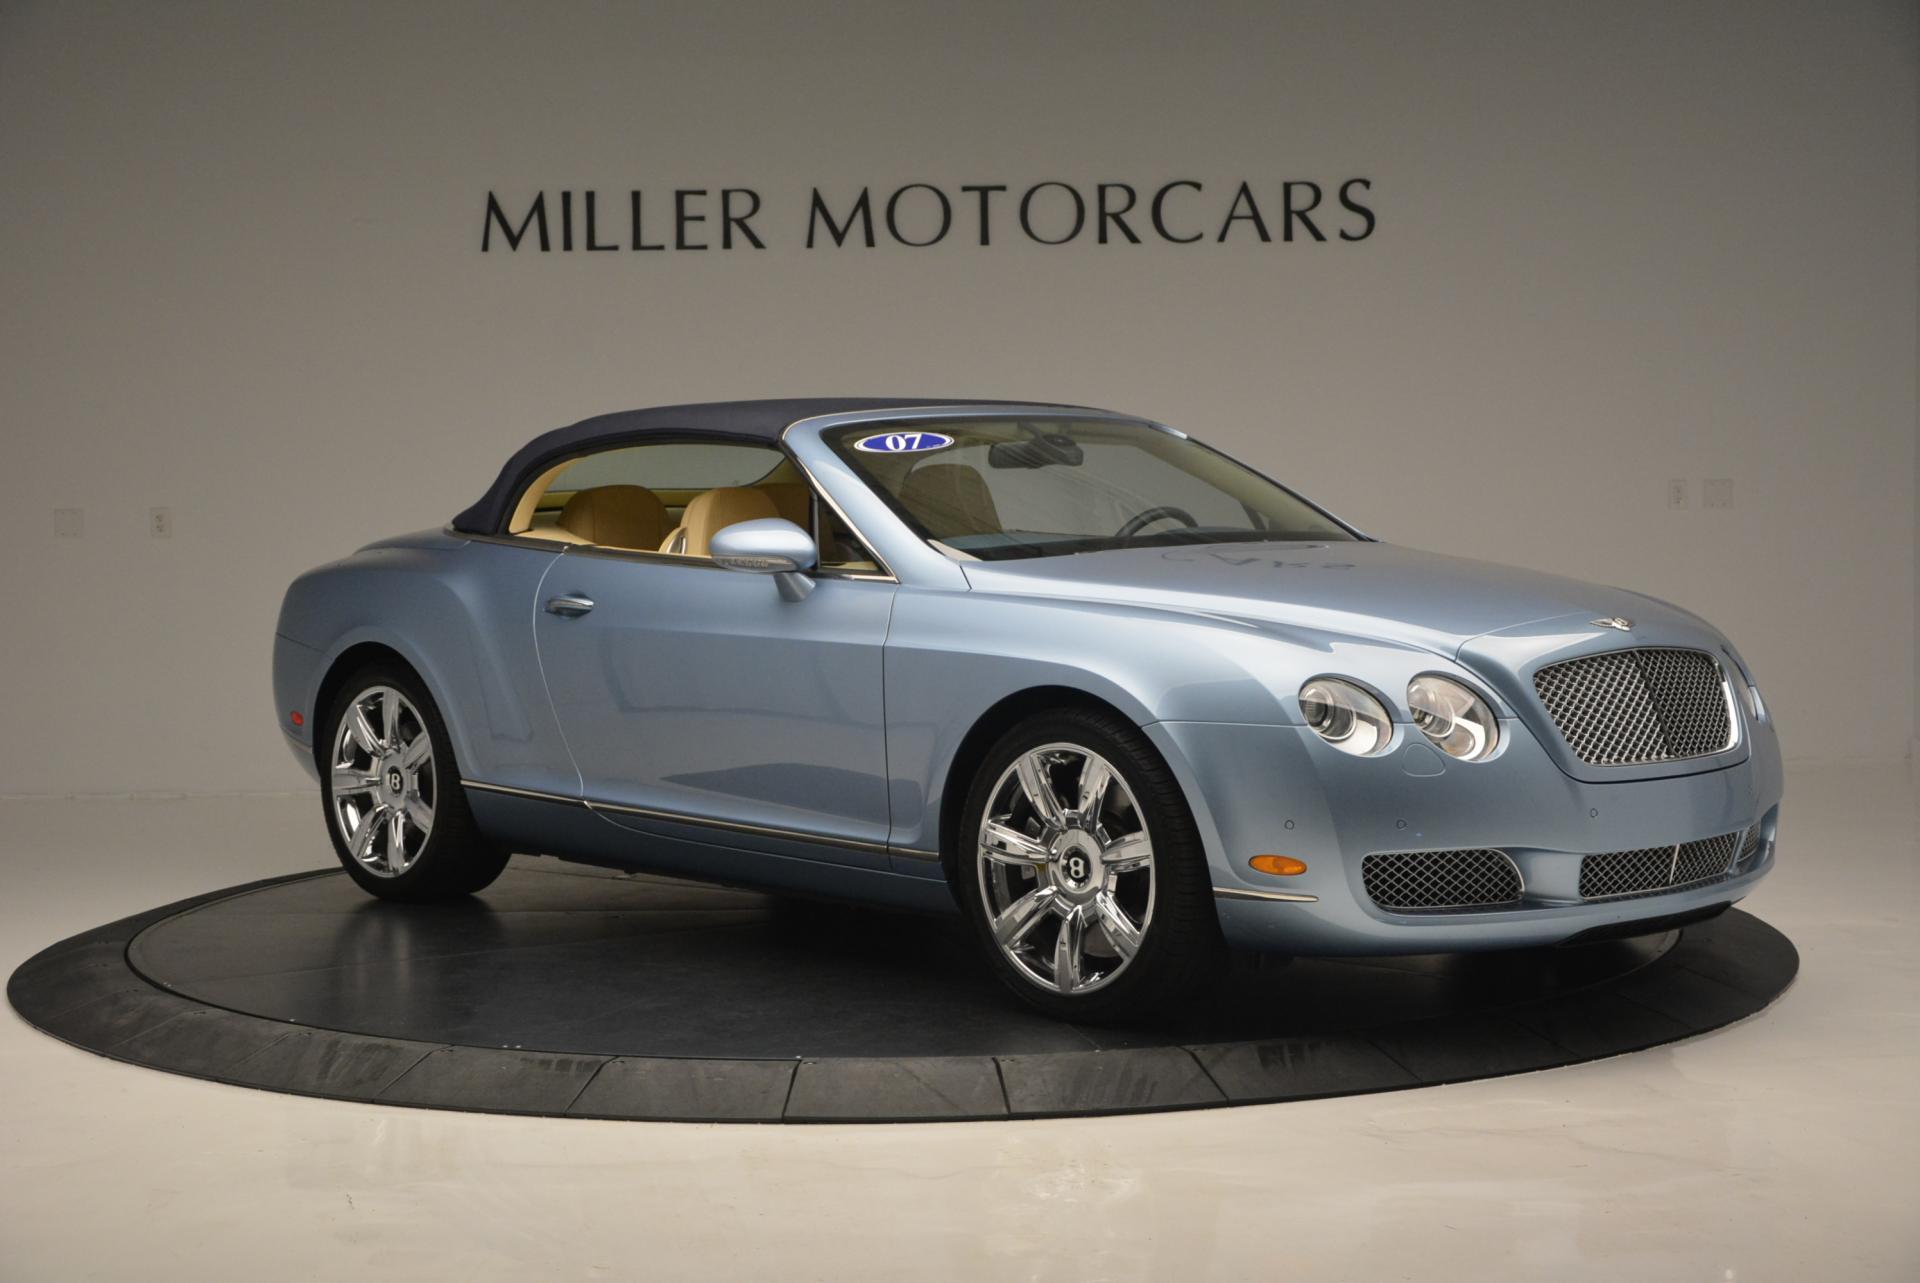 Used 2007 Bentley Continental GTC  For Sale In Westport, CT 495_p22